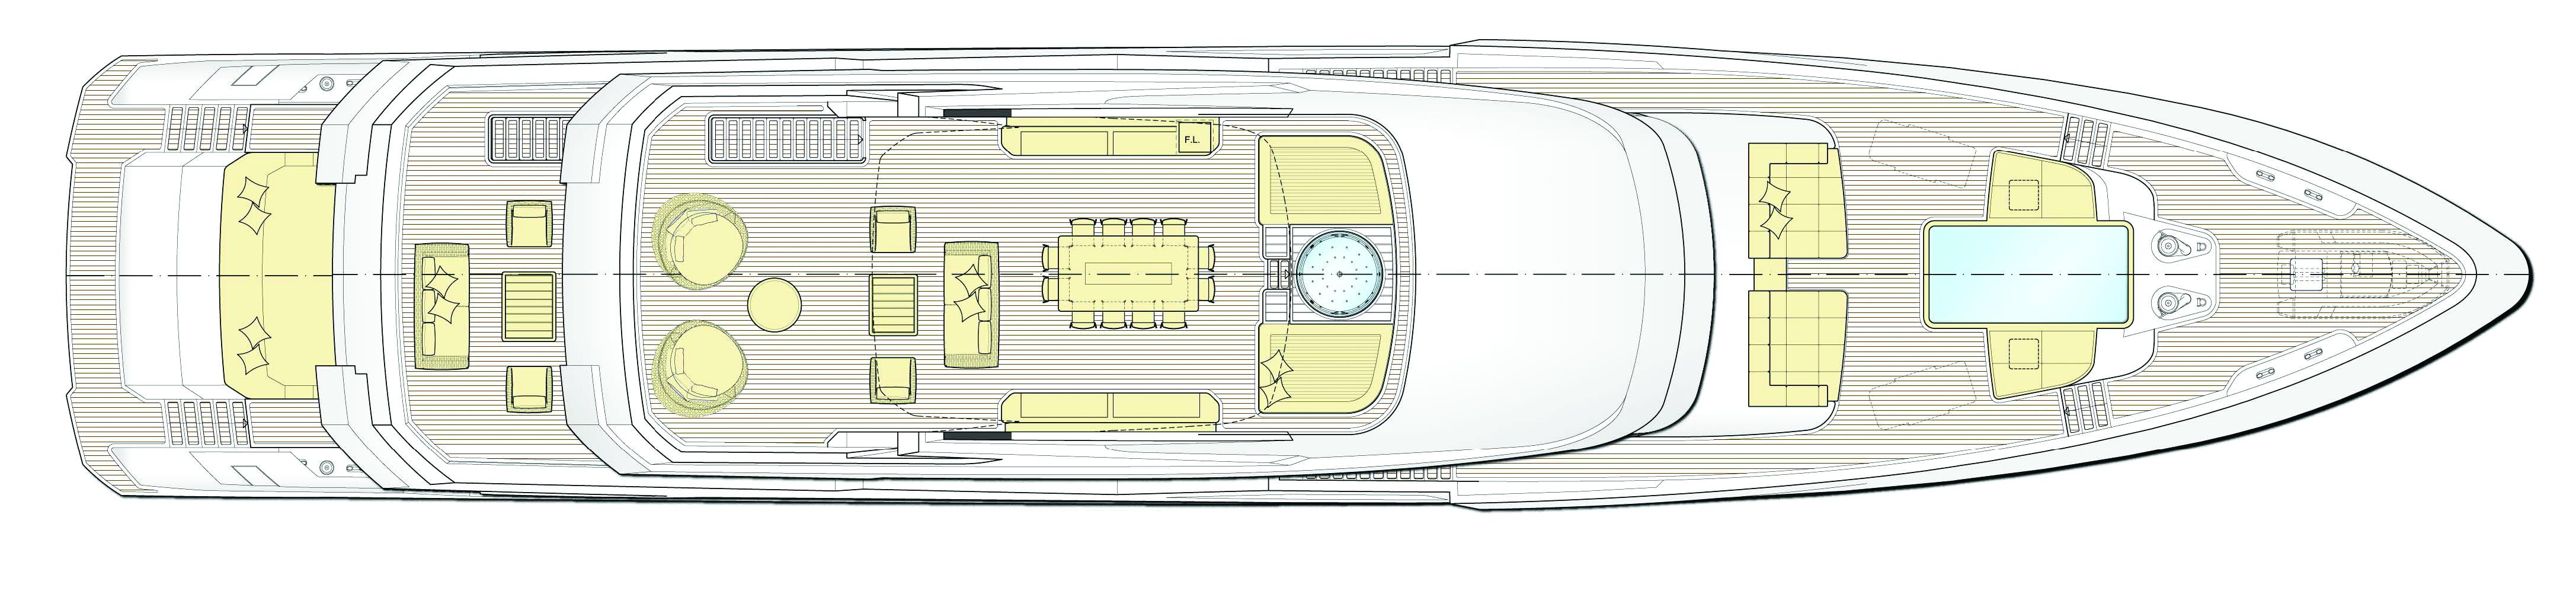 THUNDERBIRD_150--sun deck